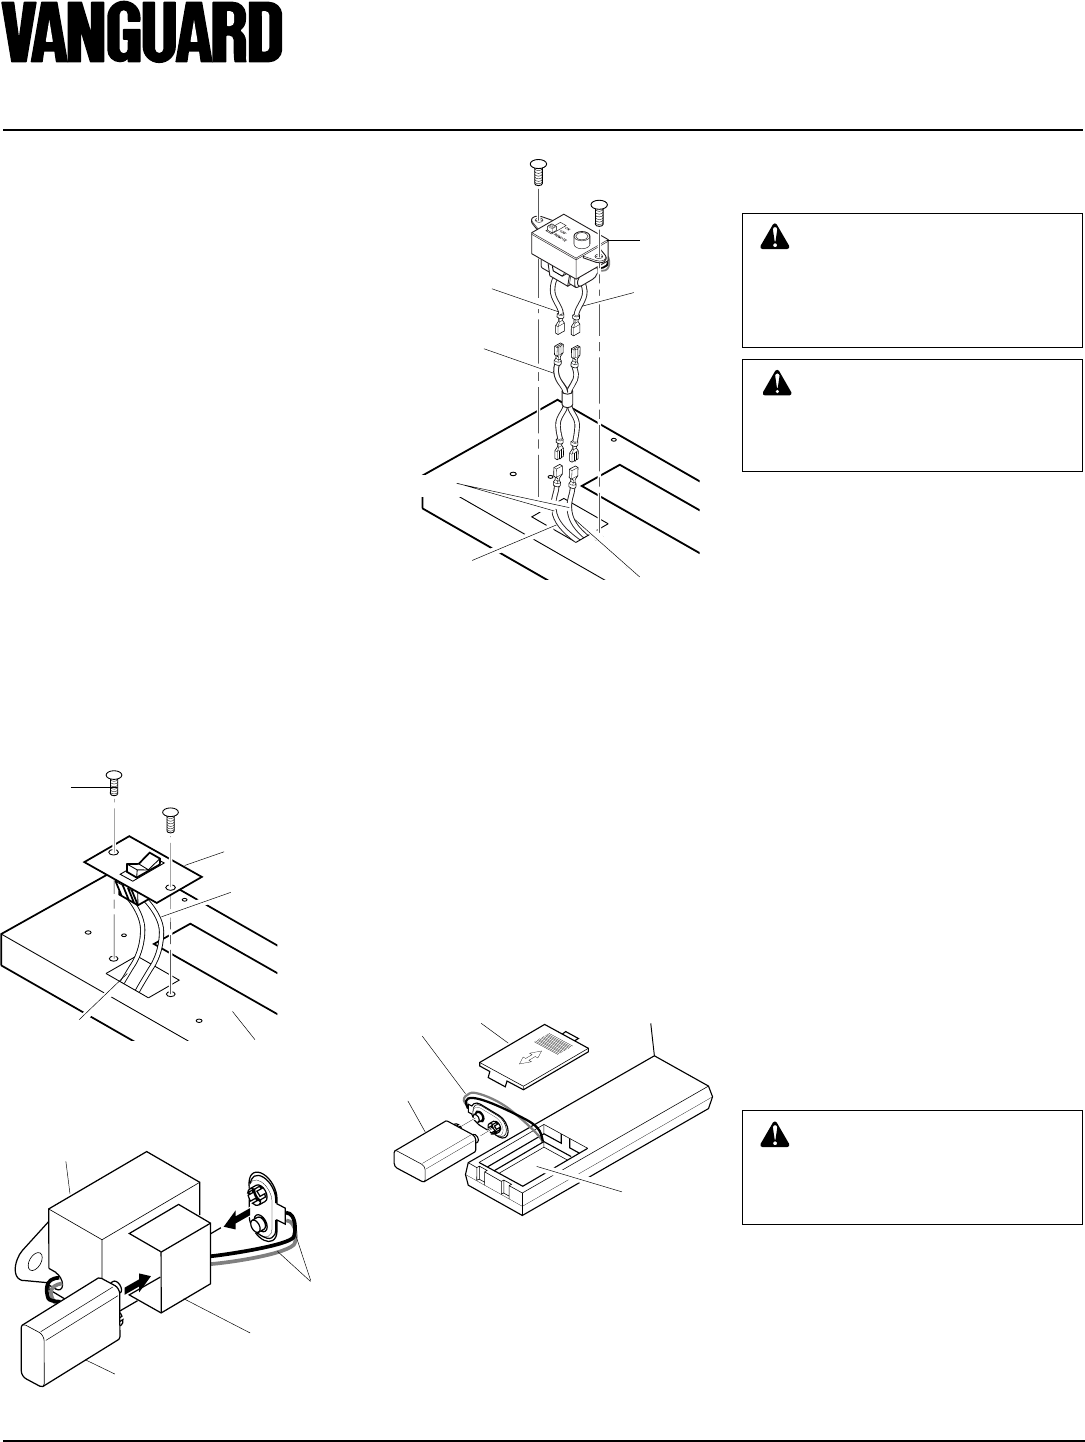 Desa Tech Vmh26pr Owners Manual Ods Pilot Wiring Diagram 104323